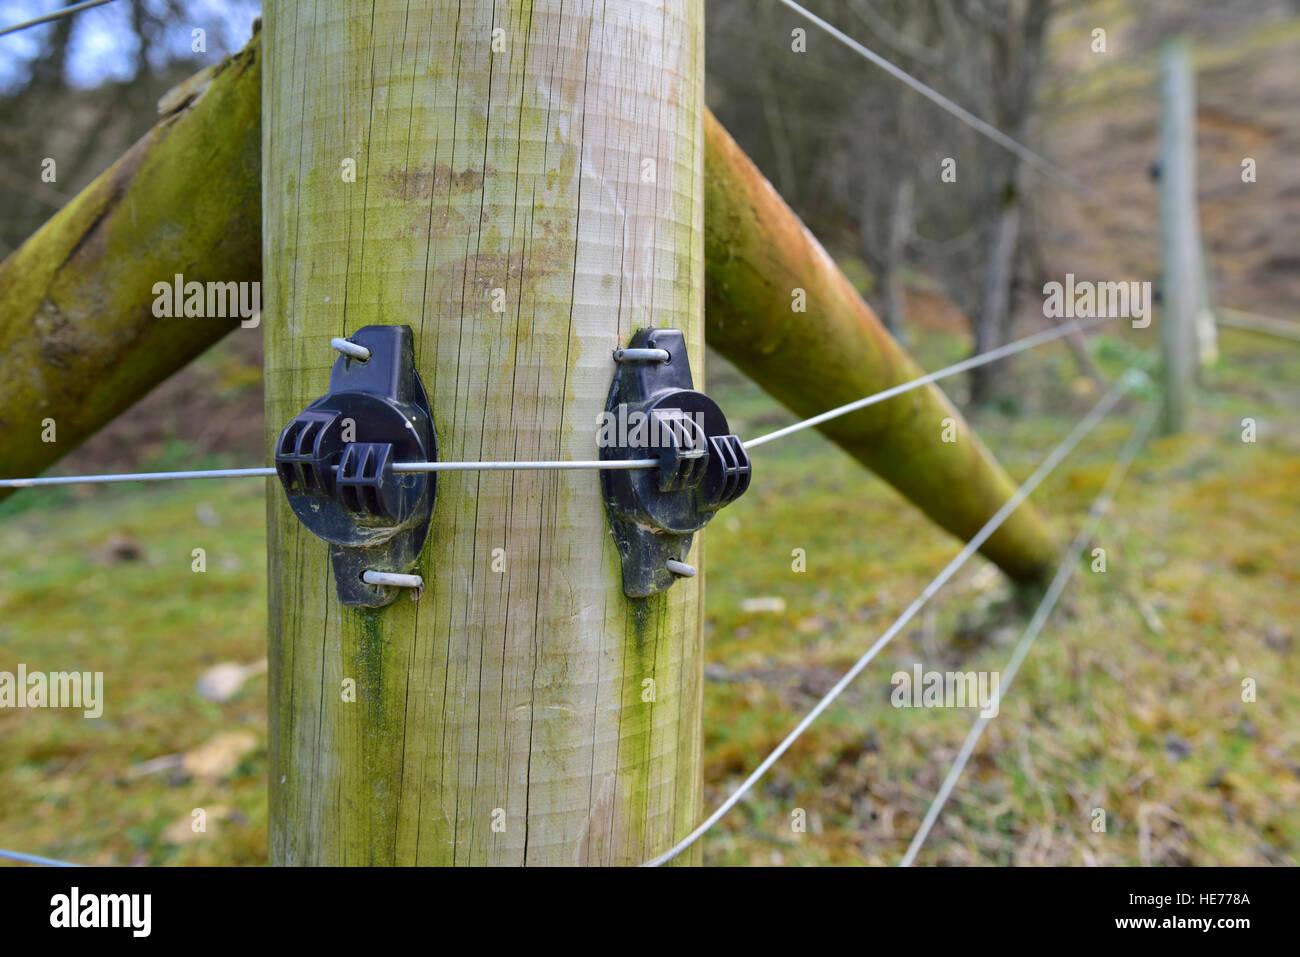 Elektrozaun Draht geht über Isolatoren auf Holzzaun Beitrag, England ...